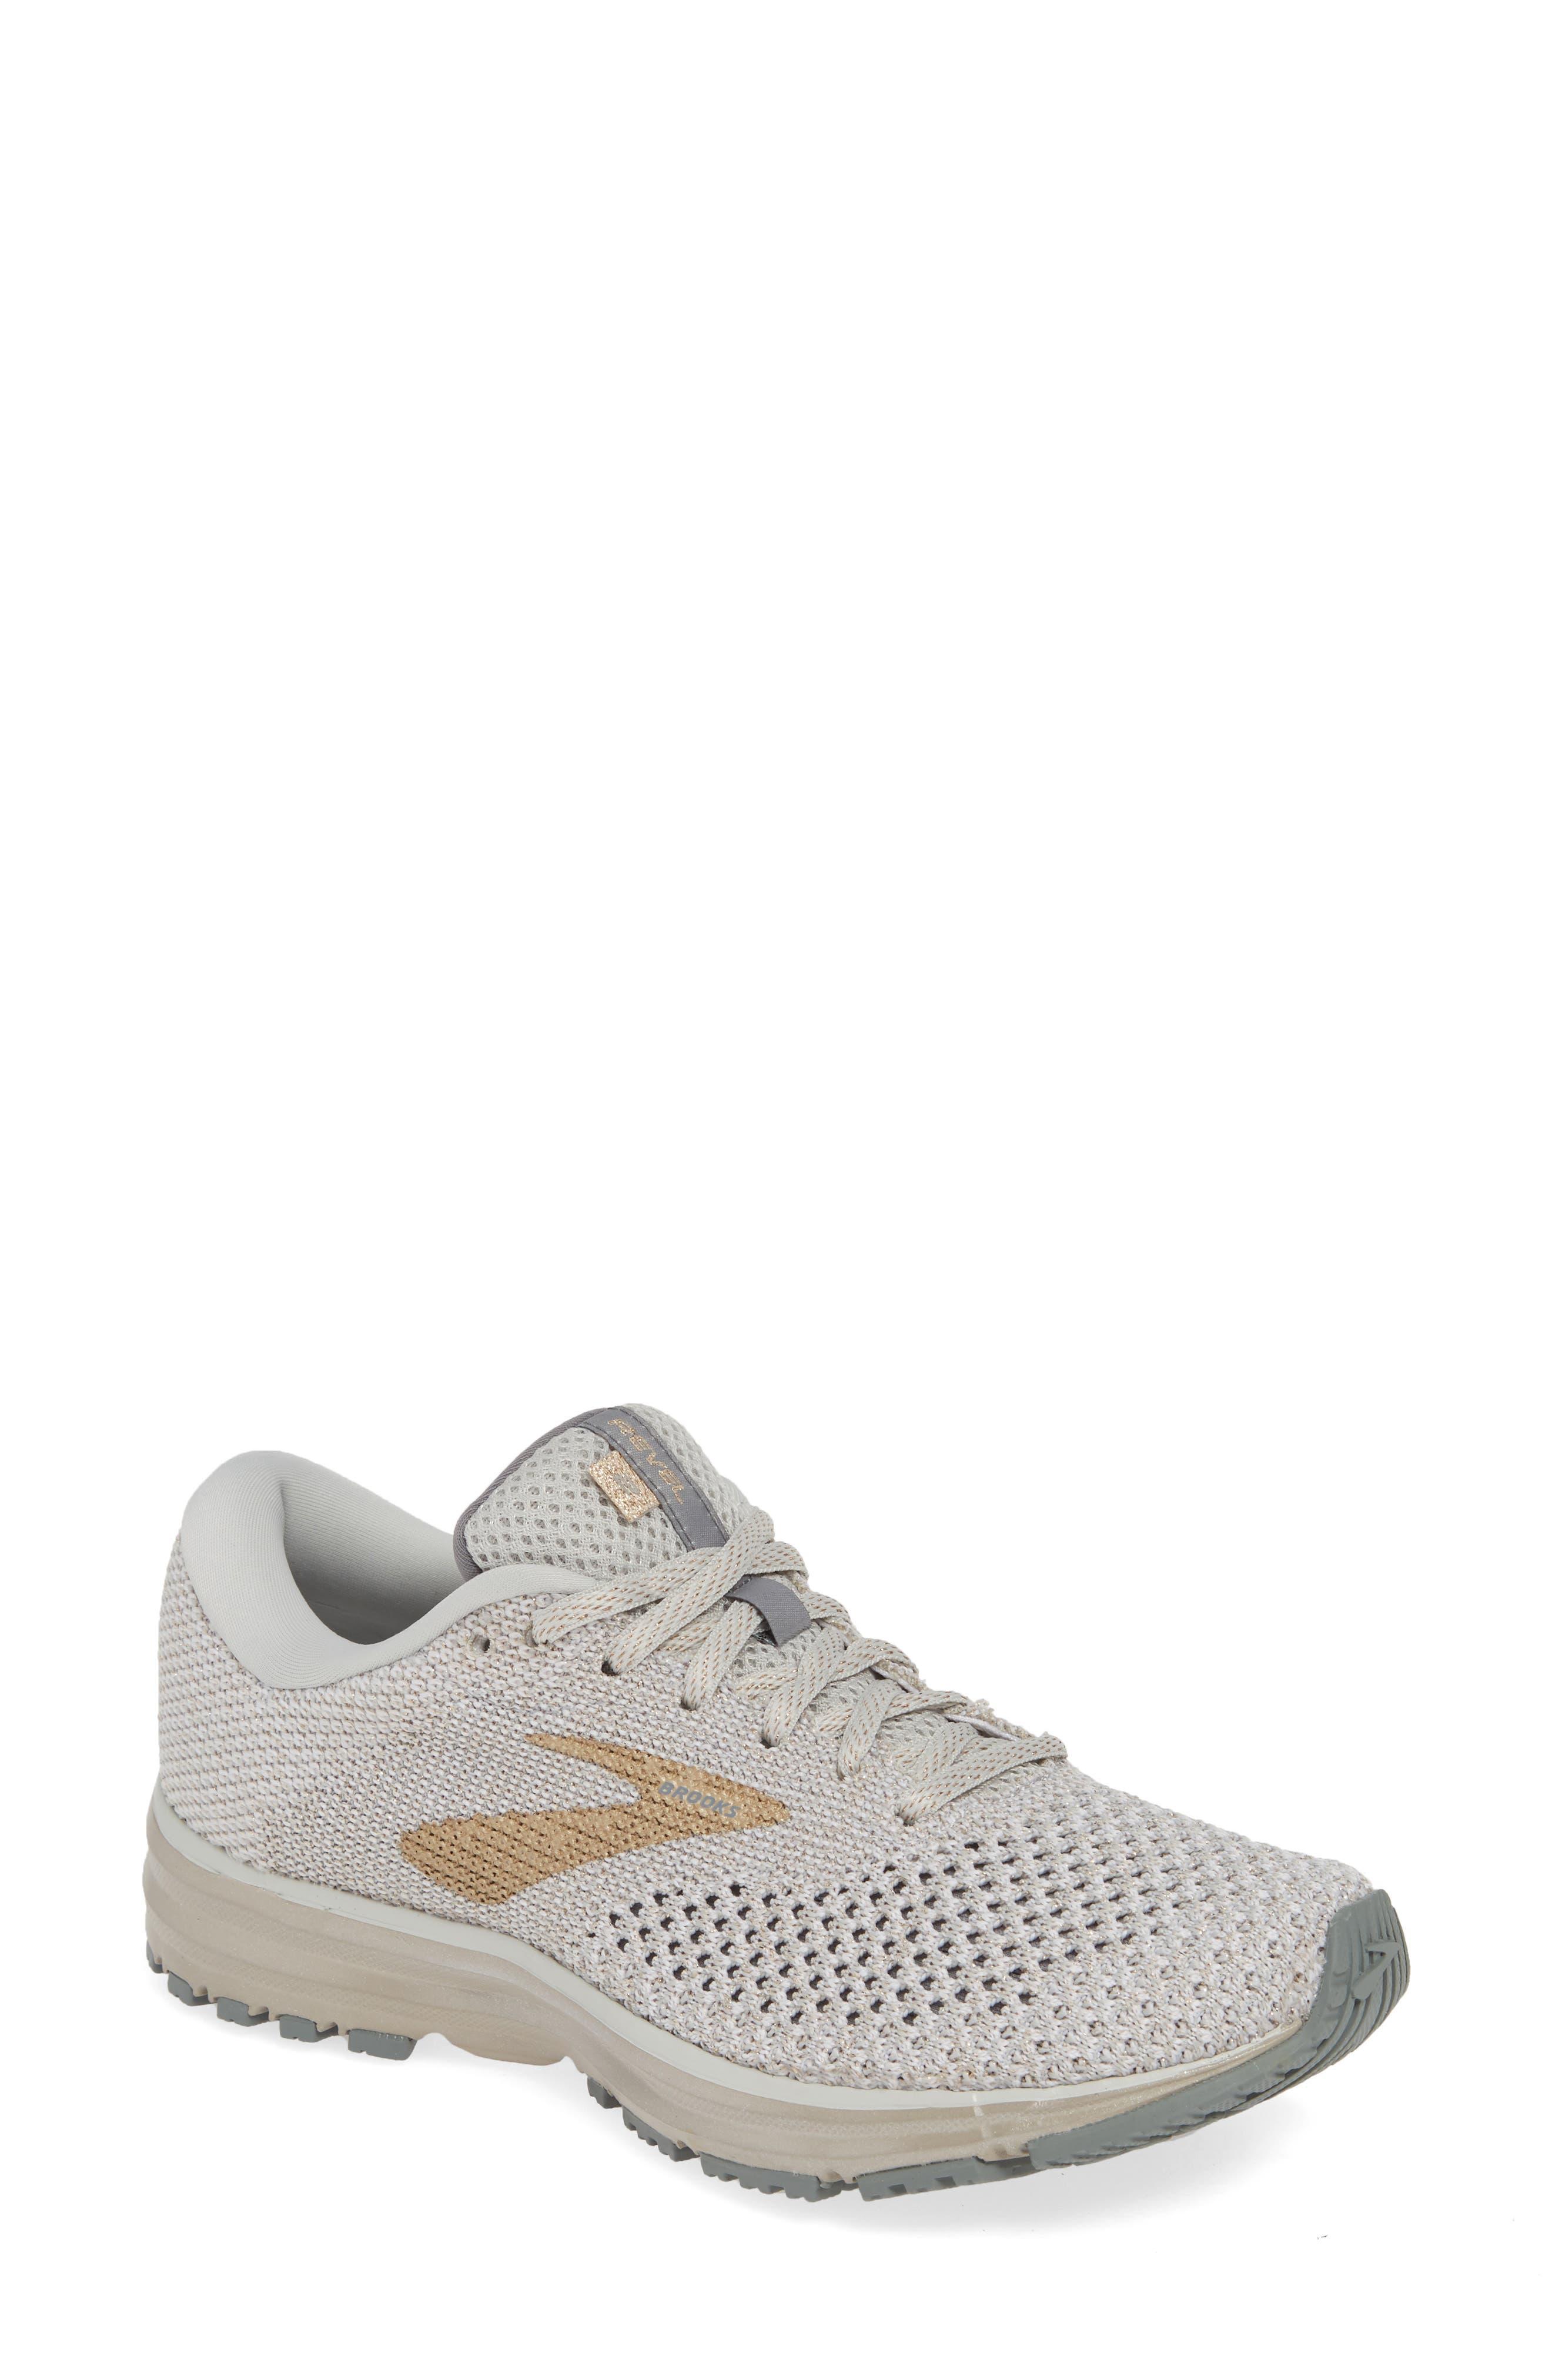 Brooks Revel 2 Running Shoe B - White